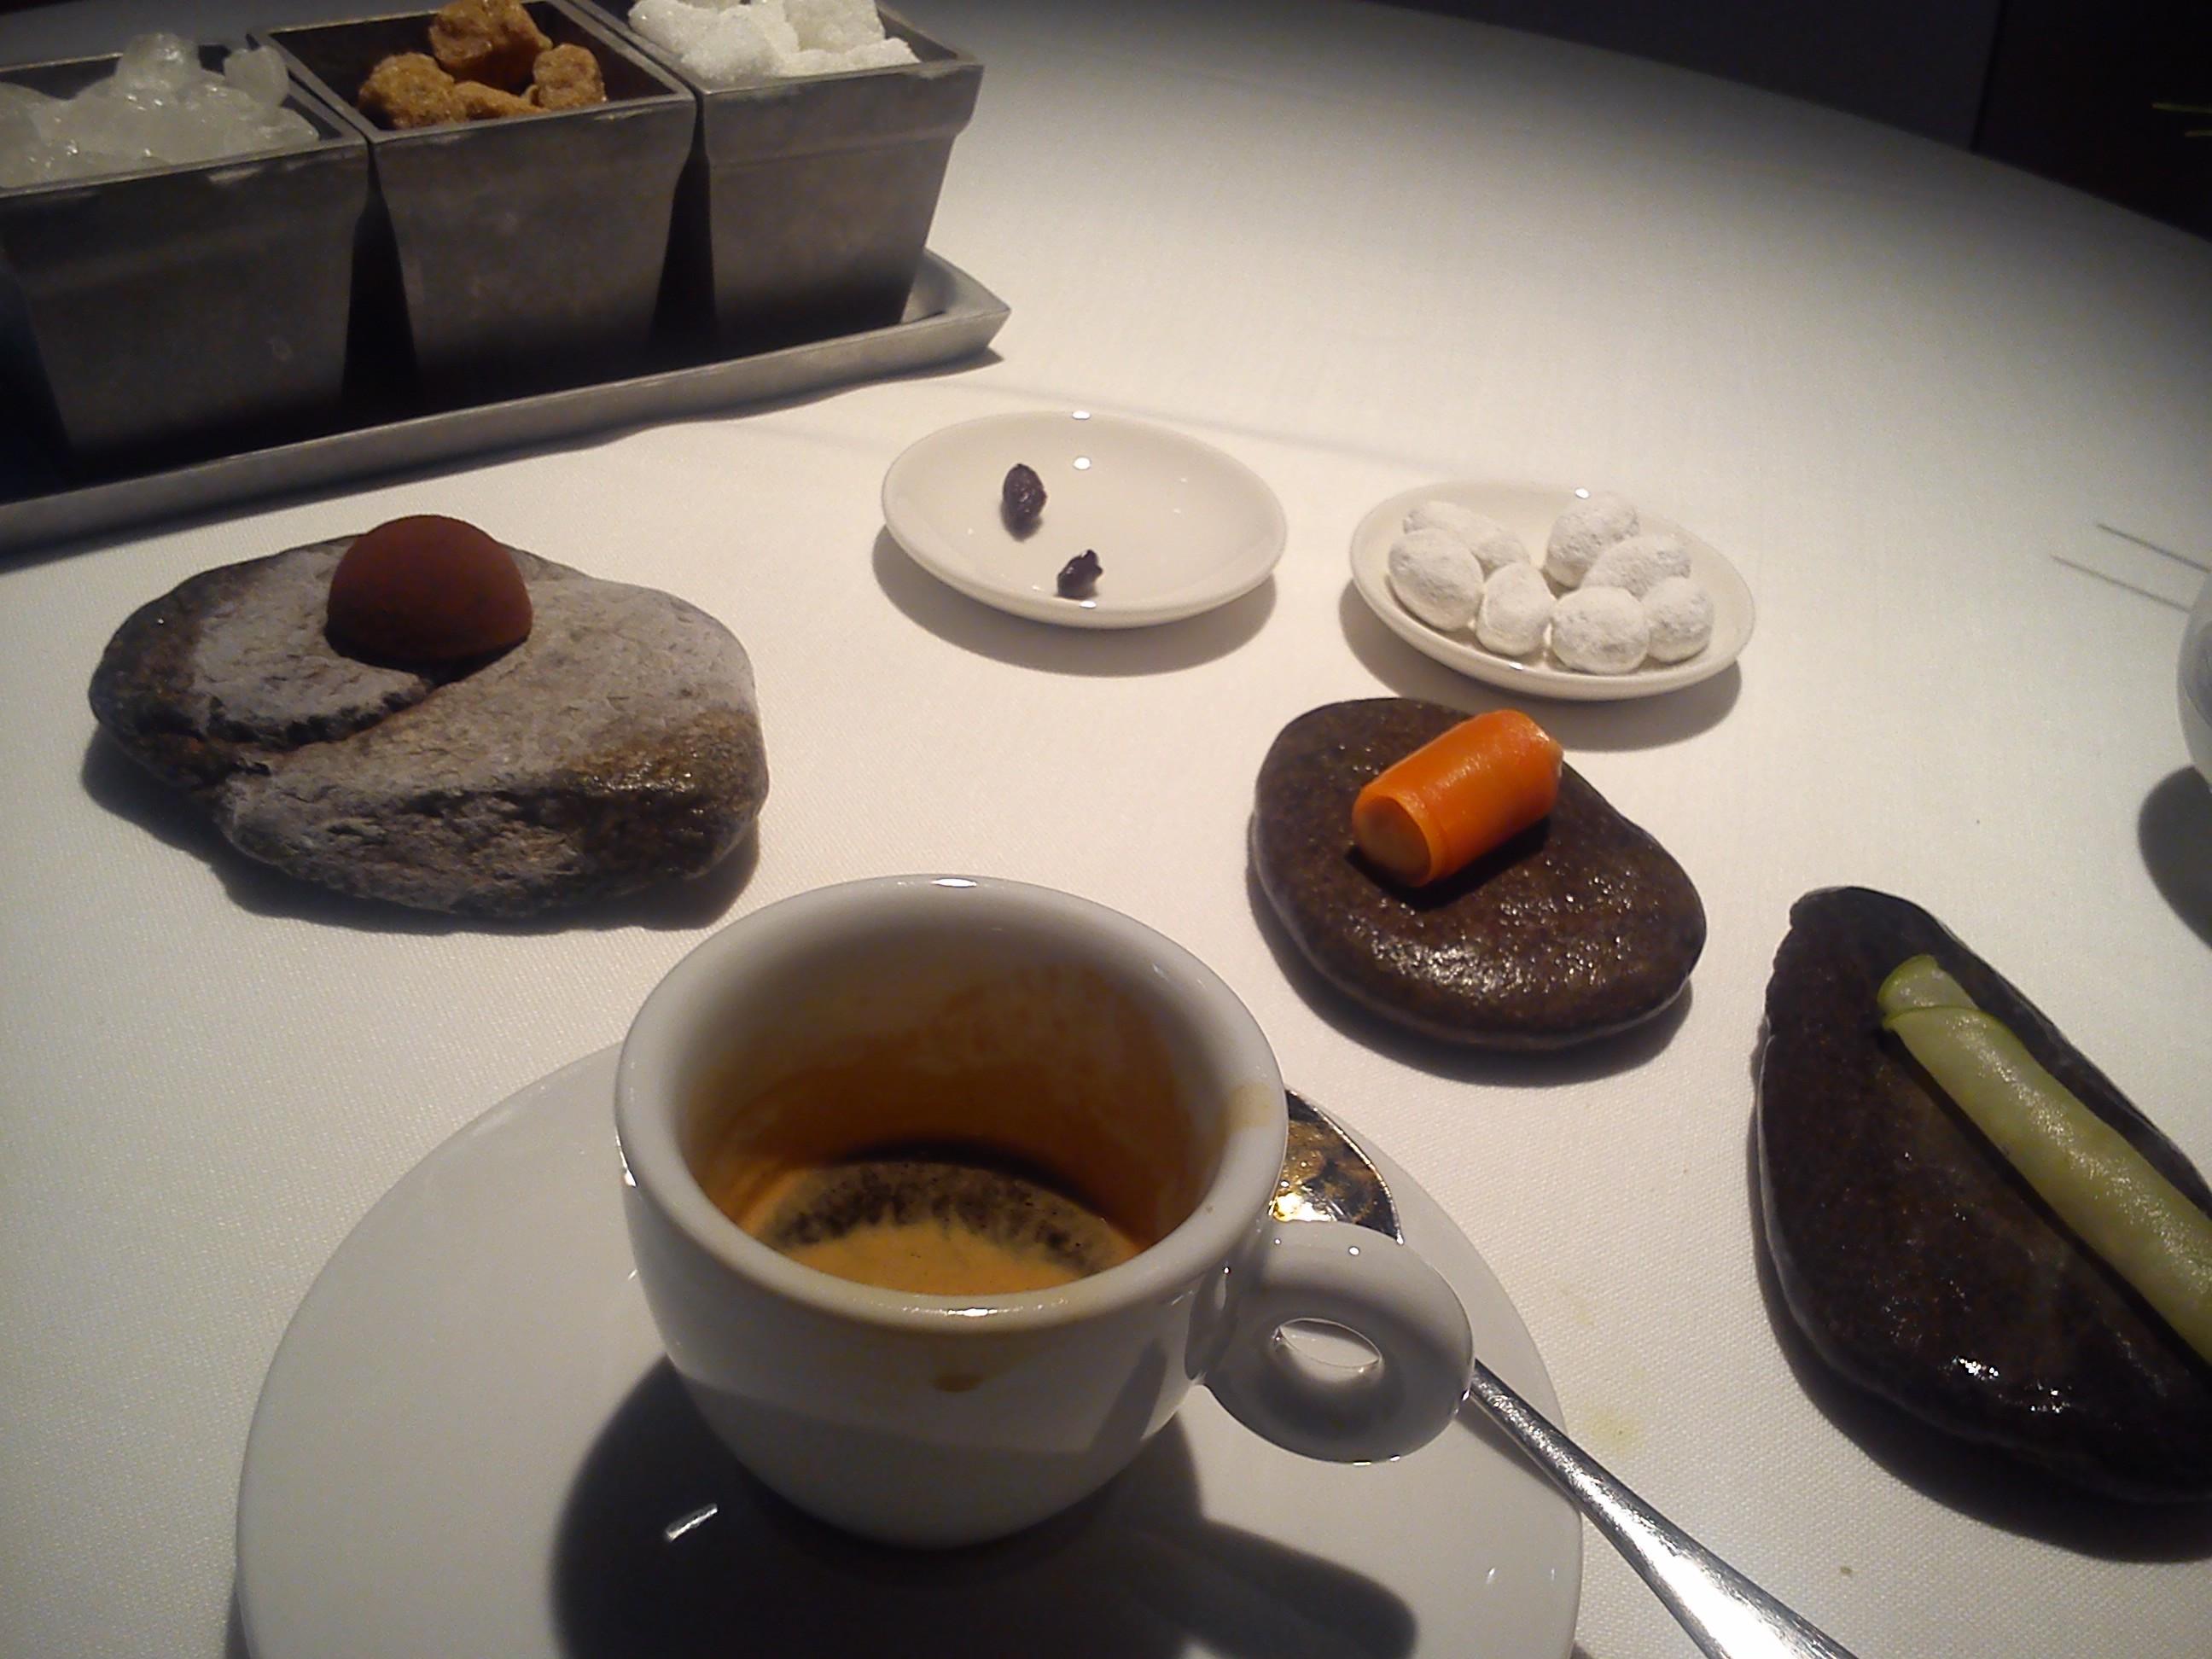 Hisop en Barcelona Café y Petits Fours